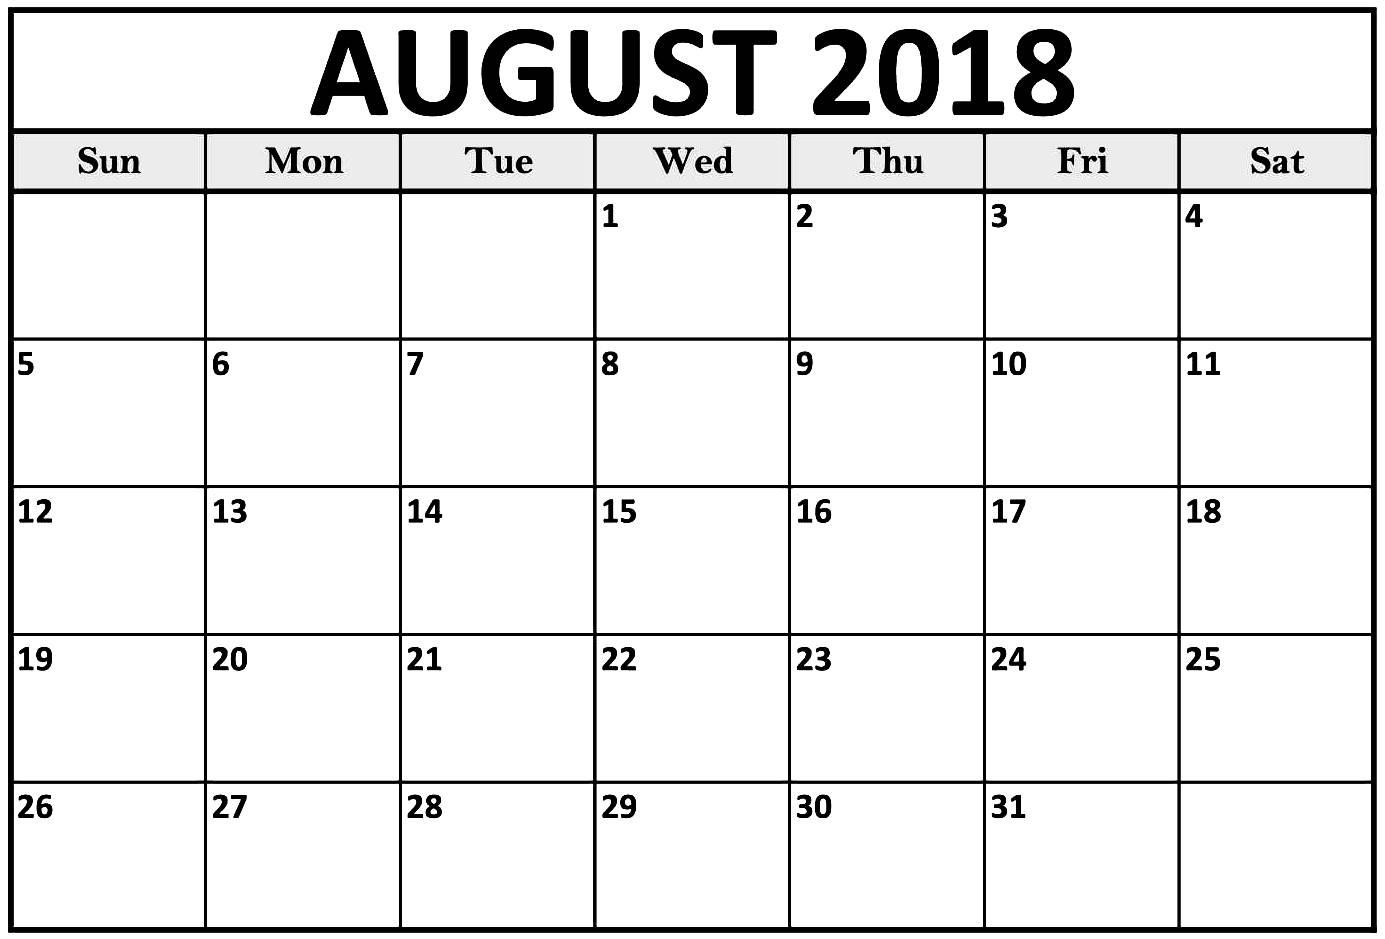 031 August Printable Calendar Outstanding 2018 Word Canada December for Blank Calendar August Template Australia